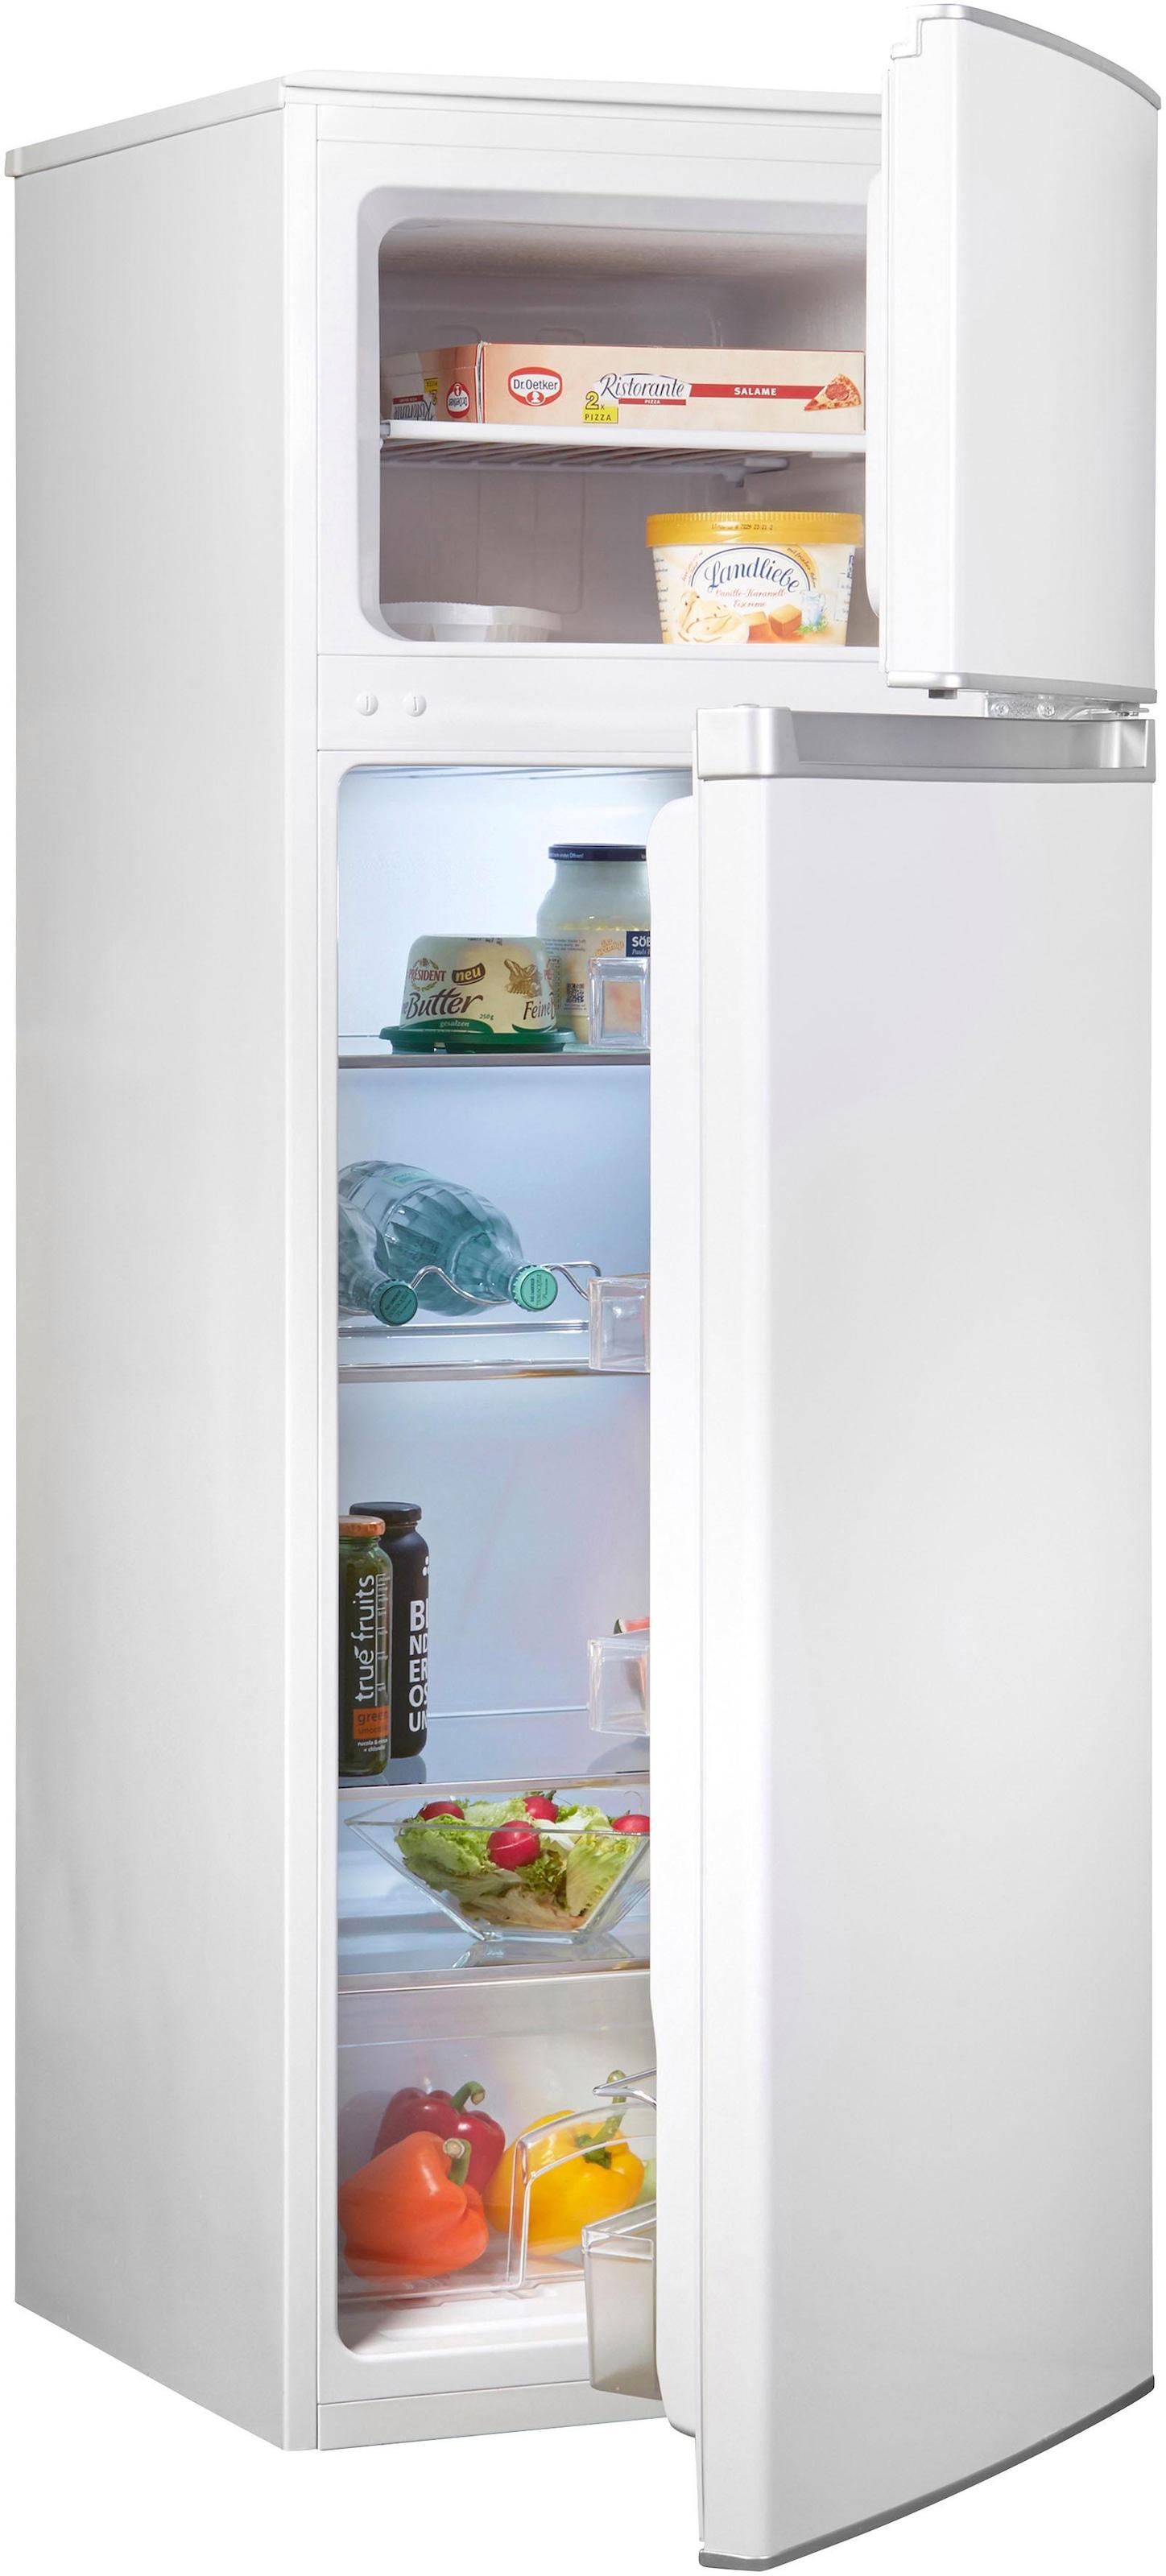 Gorenje Kühlschrank Vw Preis : Gorenje retro kühlschrank preisvergleich elsie gomez